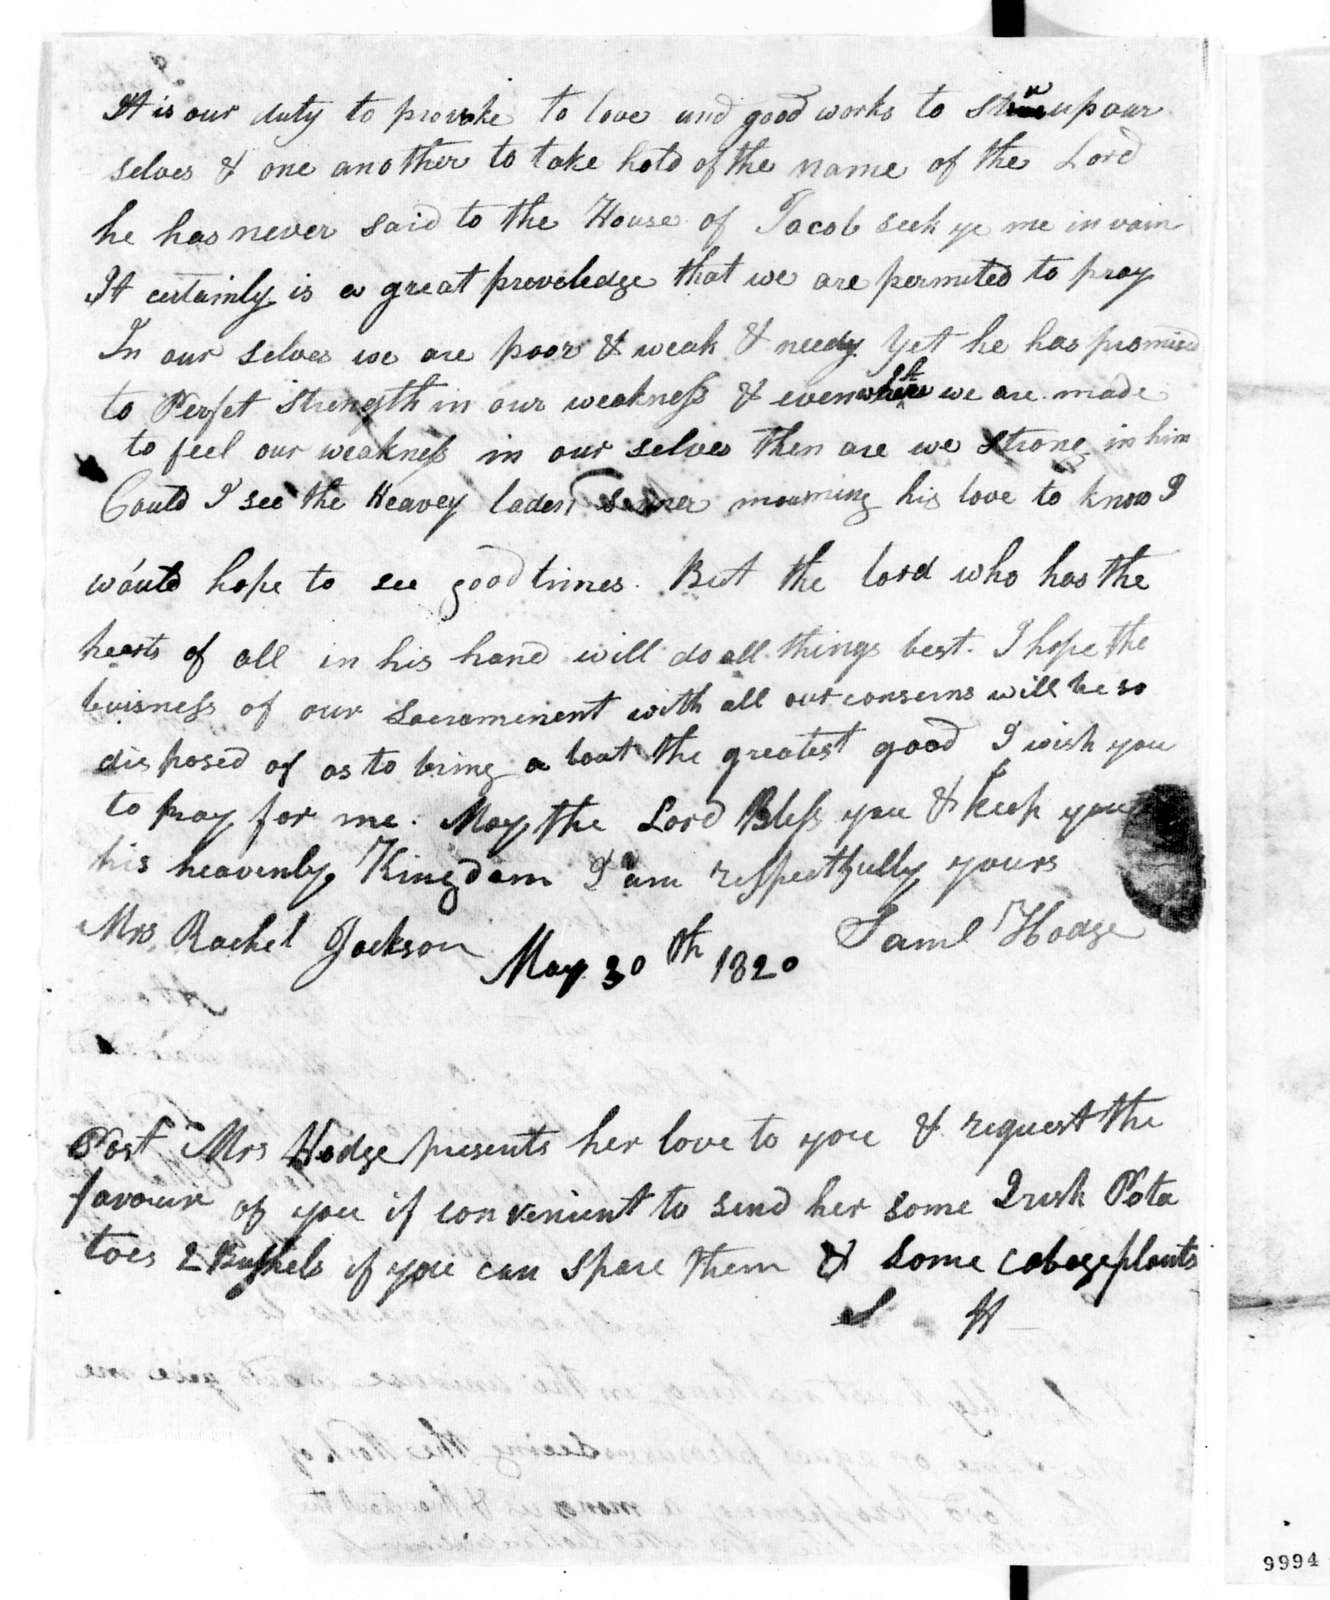 Samuel Hodge to Rachel Donelson Jackson, May 30, 1820